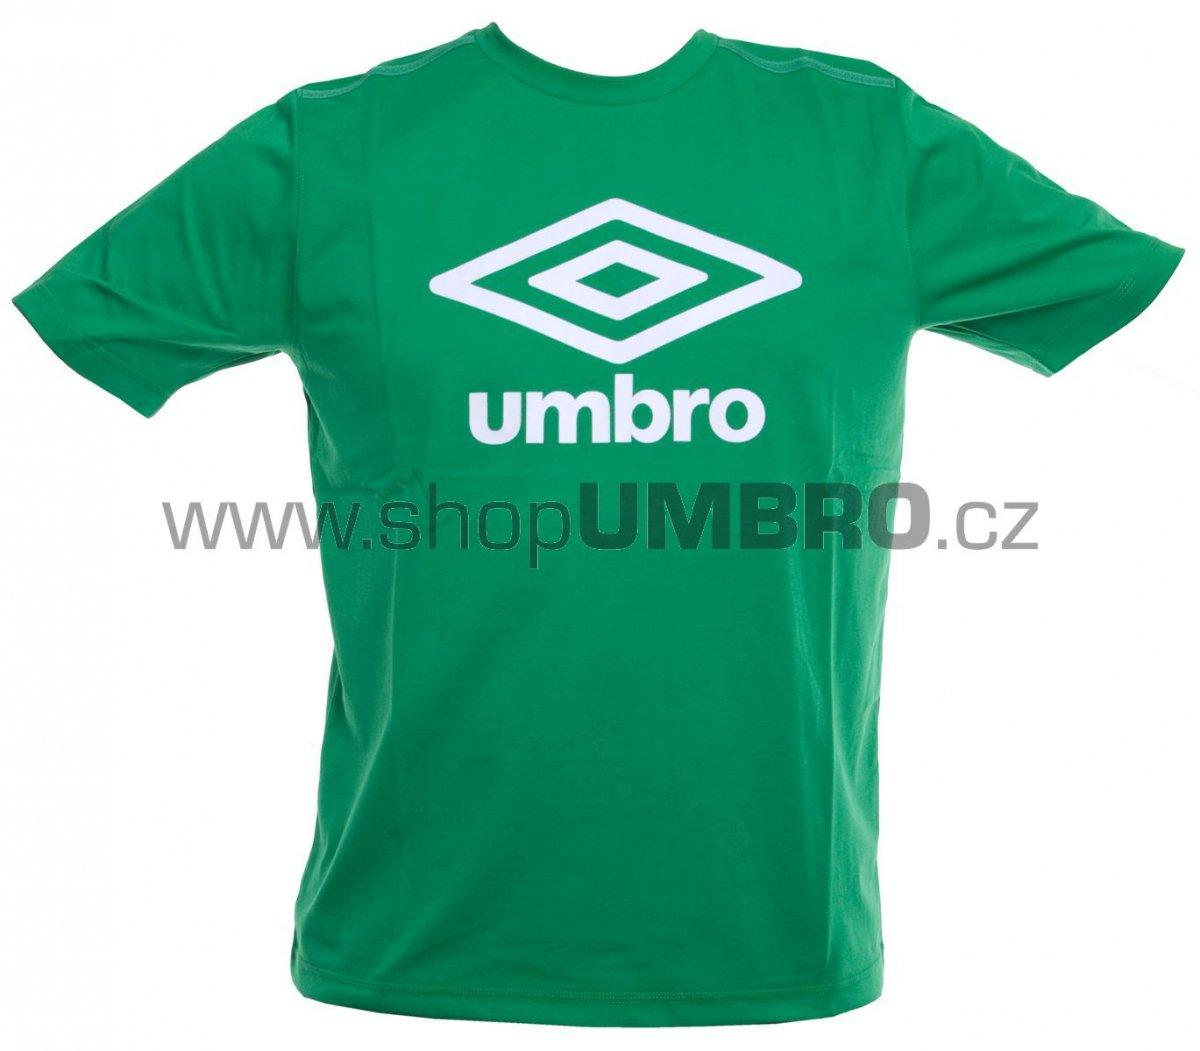 Umbro Triko TRNG FETTES zeleno-bílé junior - Trika